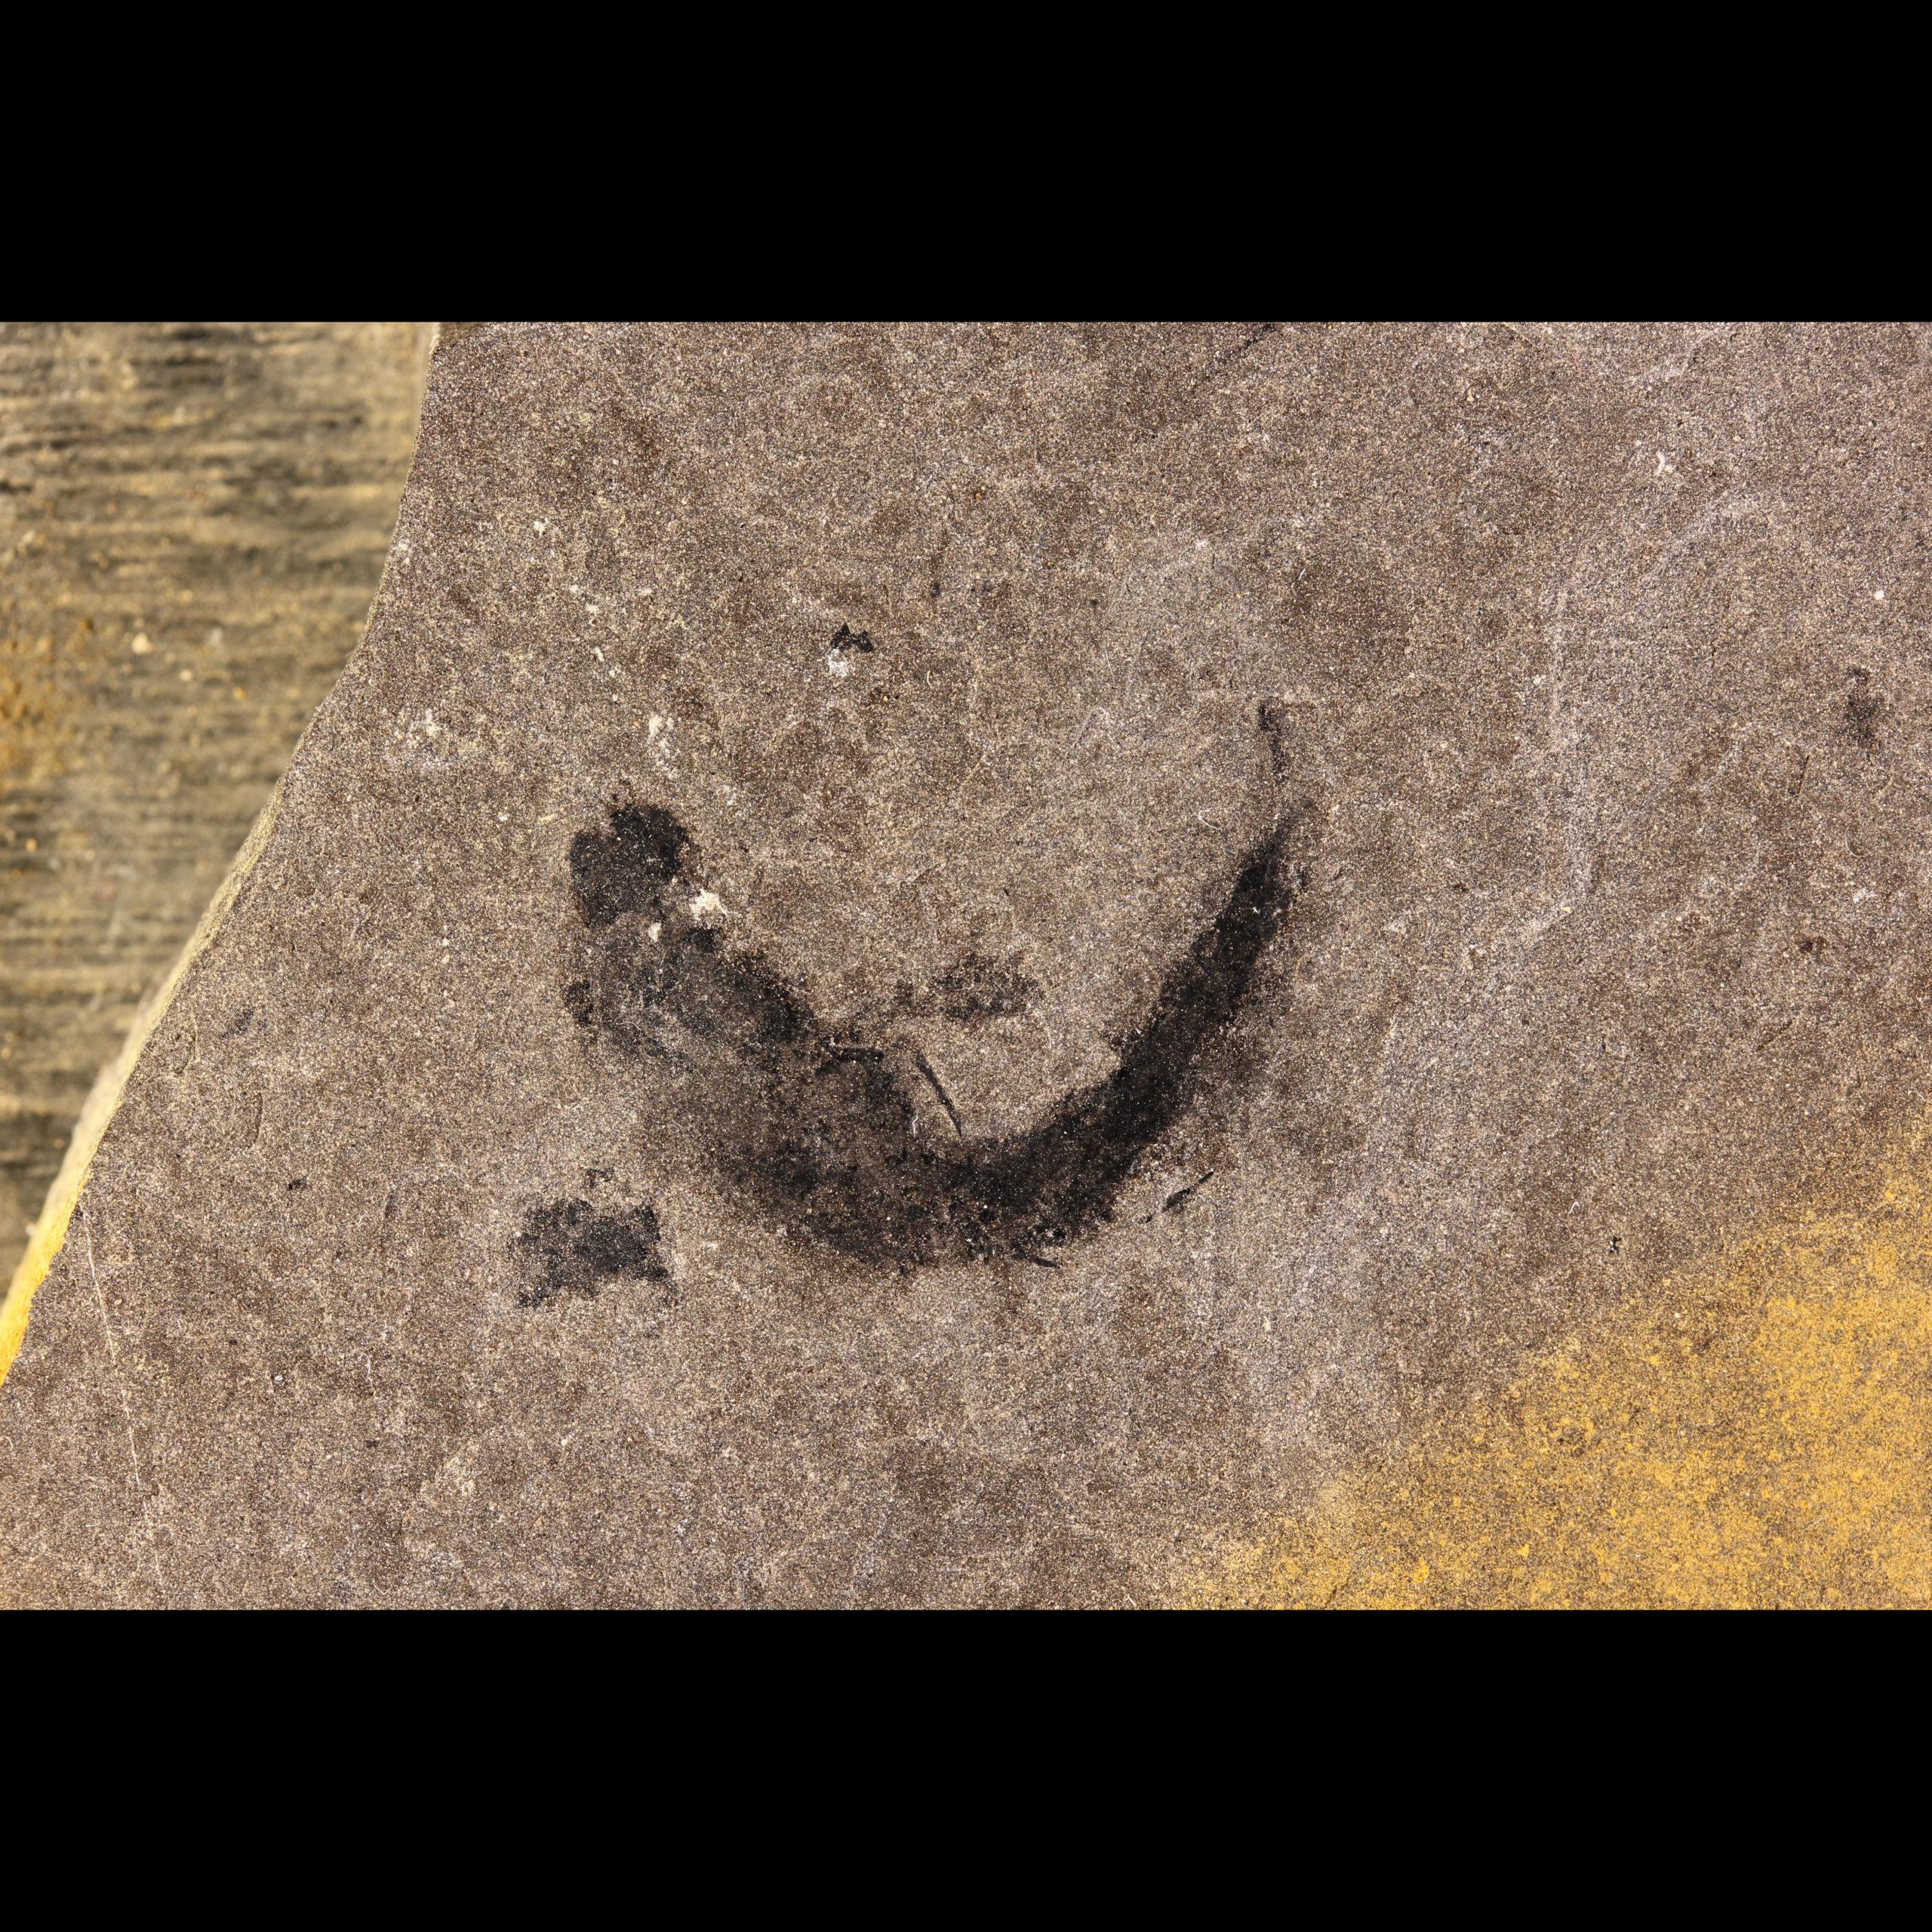 shark fossil mesacanthus pusillus